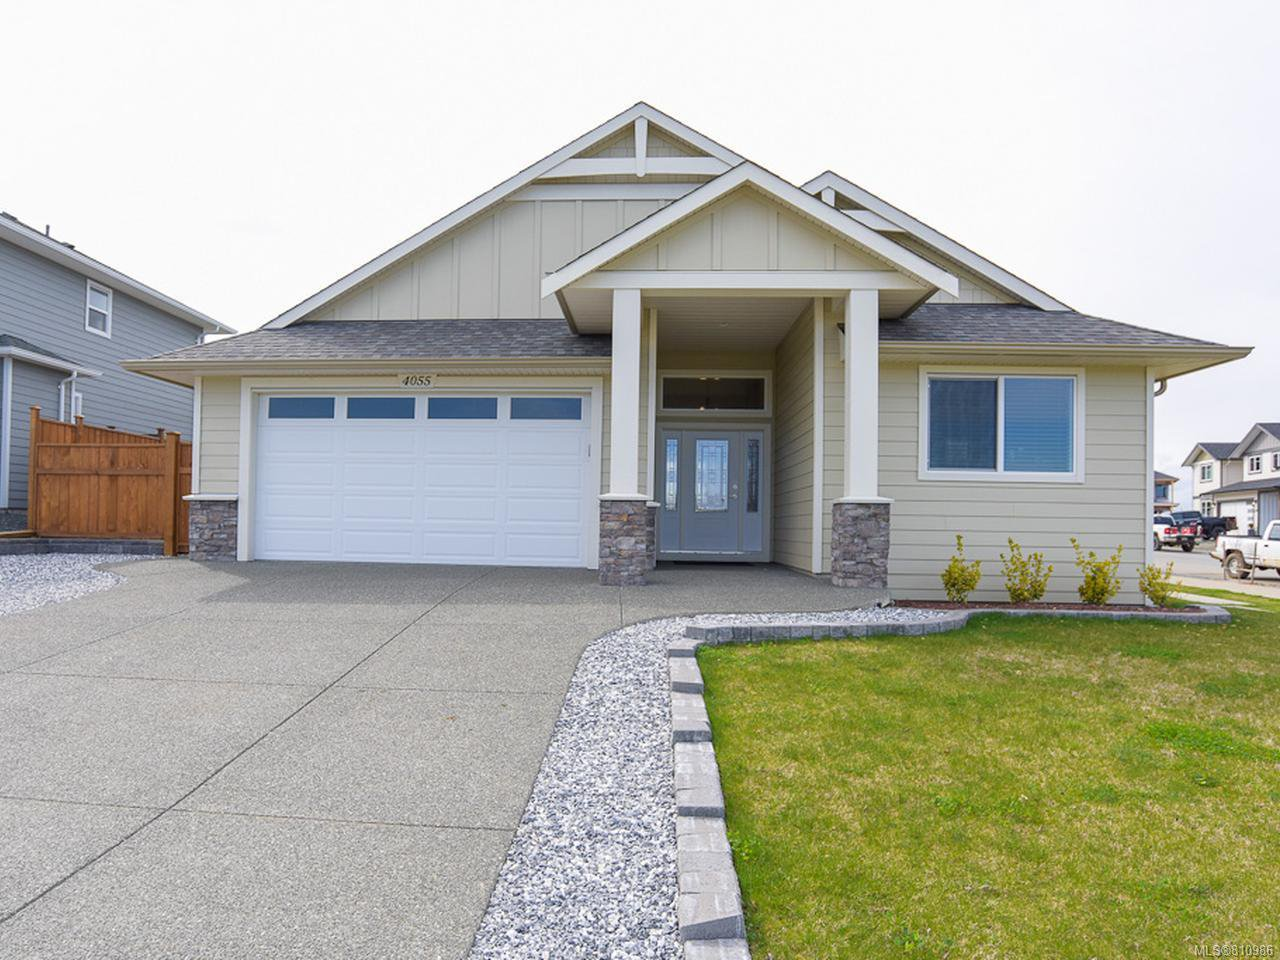 Main Photo: 4055 CHANCELLOR Crescent in COURTENAY: CV Courtenay City House for sale (Comox Valley)  : MLS®# 810986